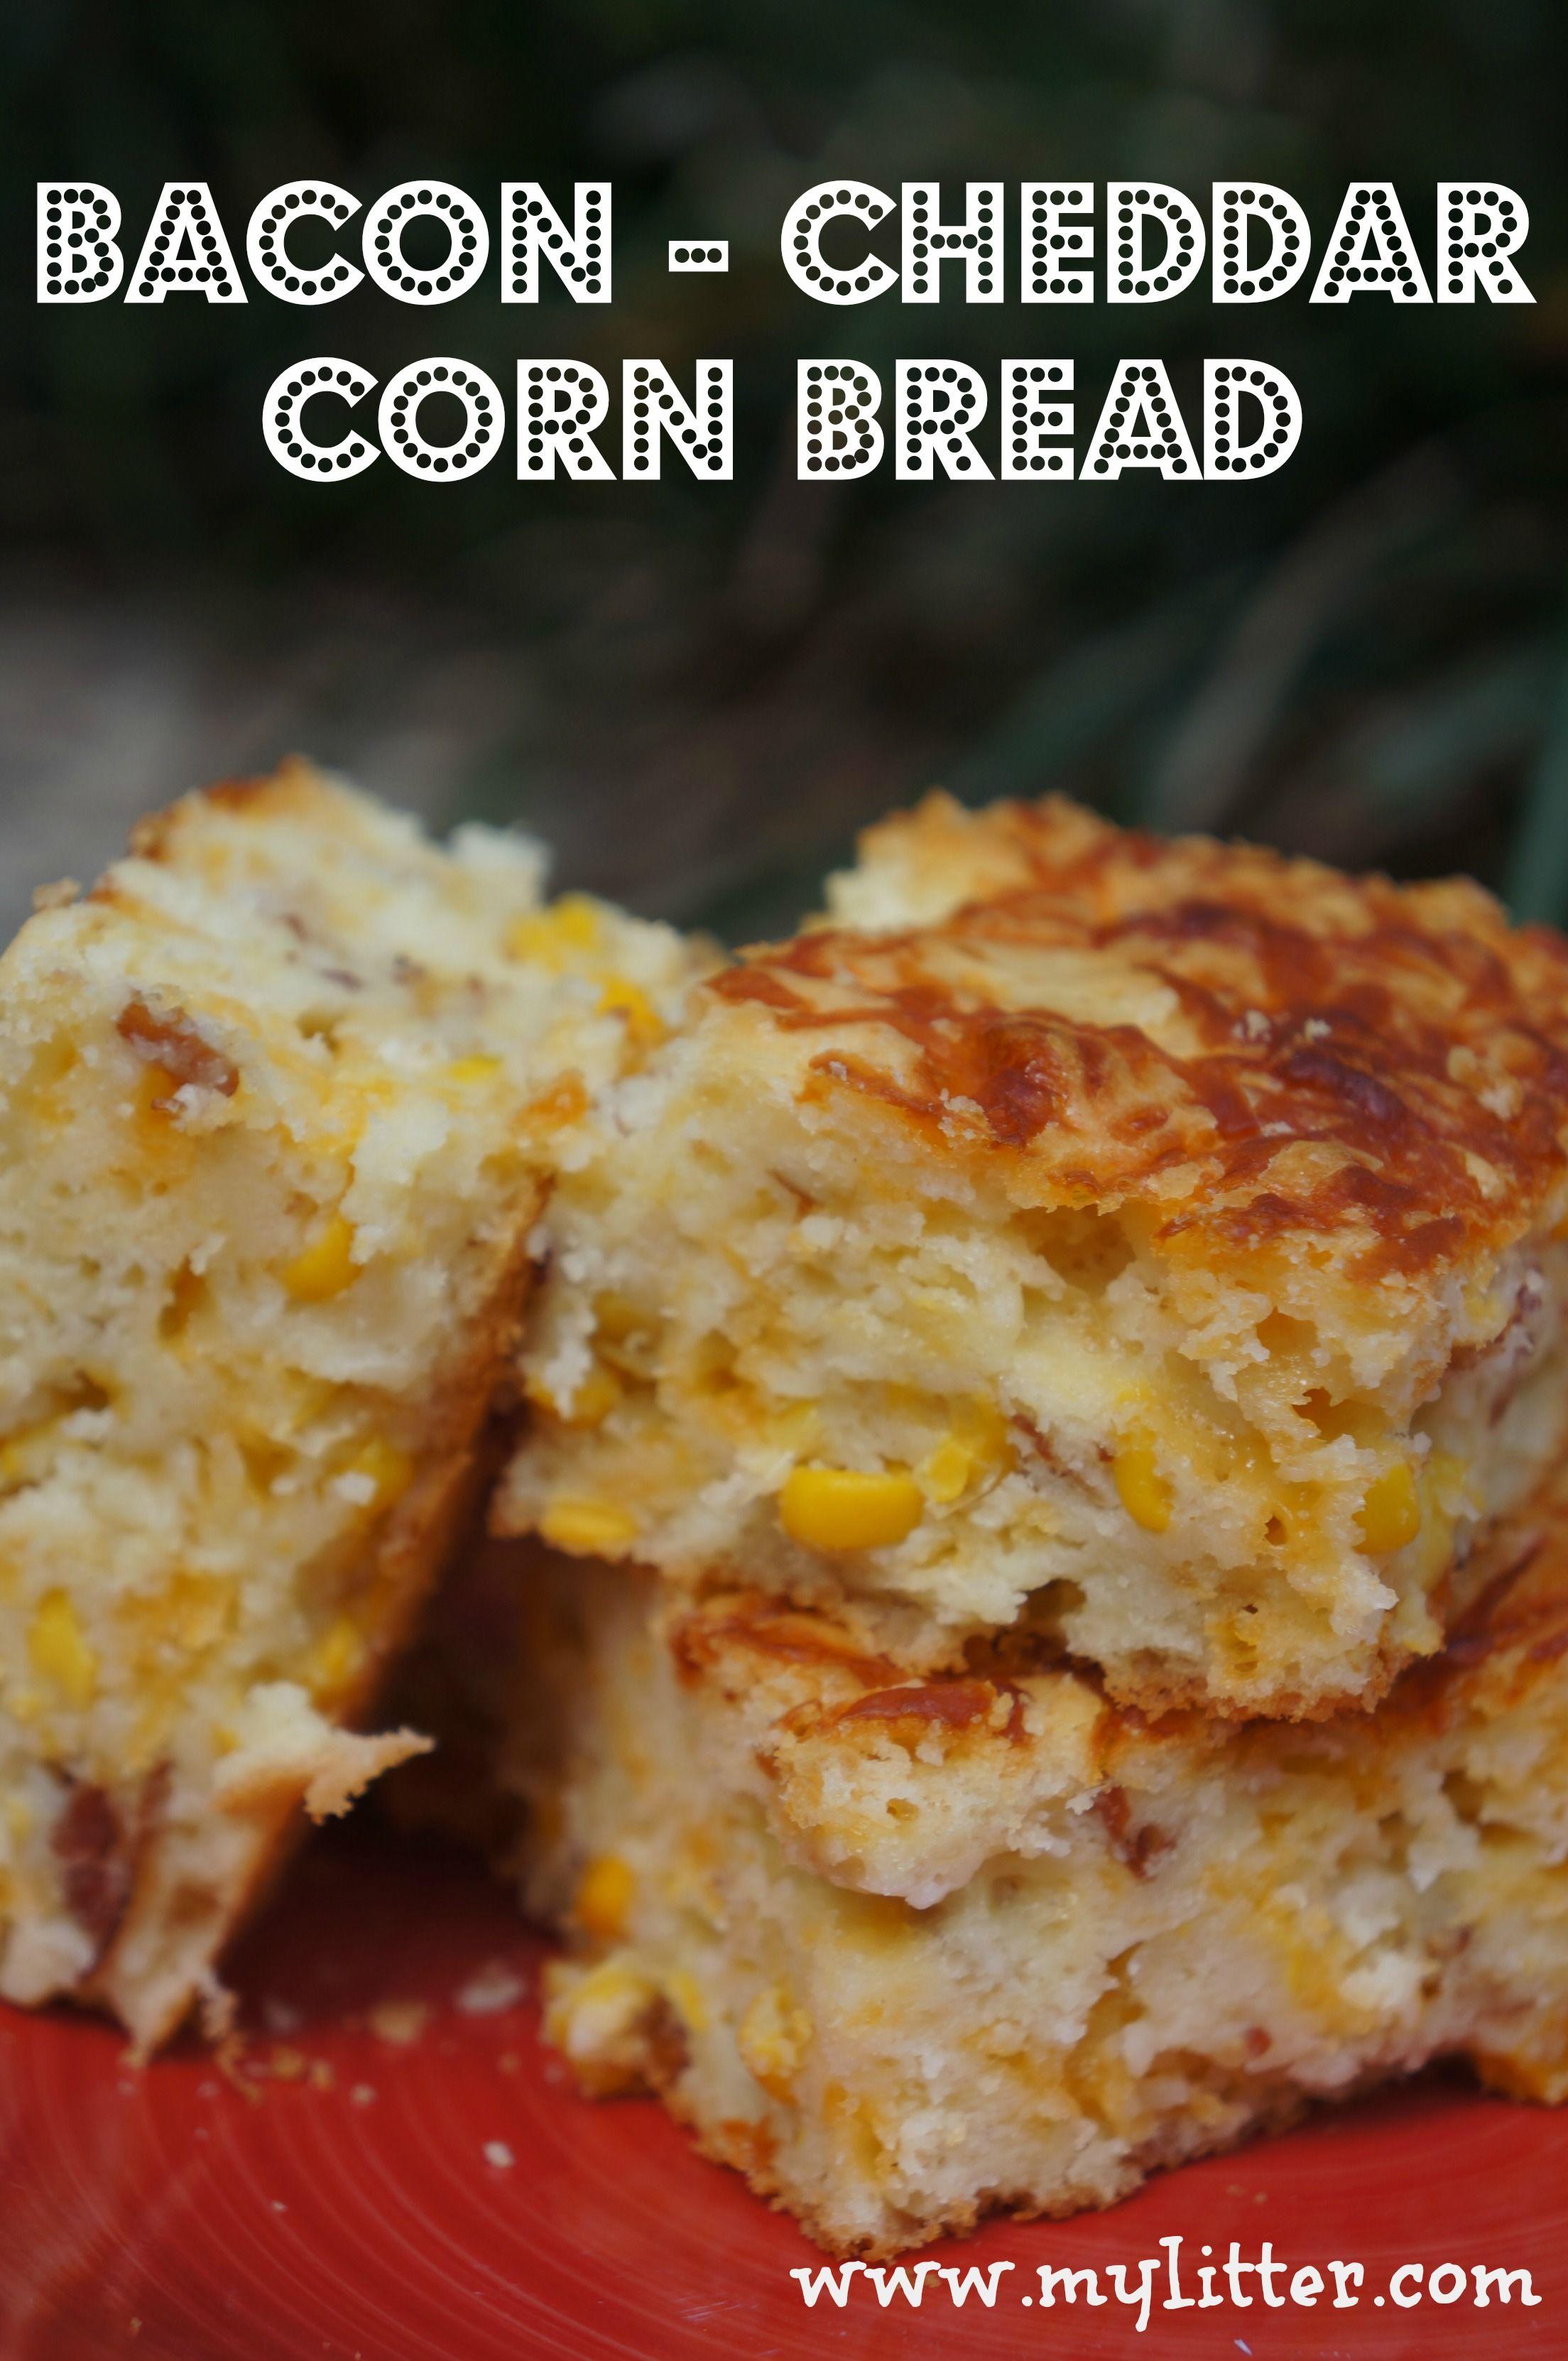 Bacon Cheddar Corn Bread Recipe Corn Bread Recipe Food Cheddar Cornbread